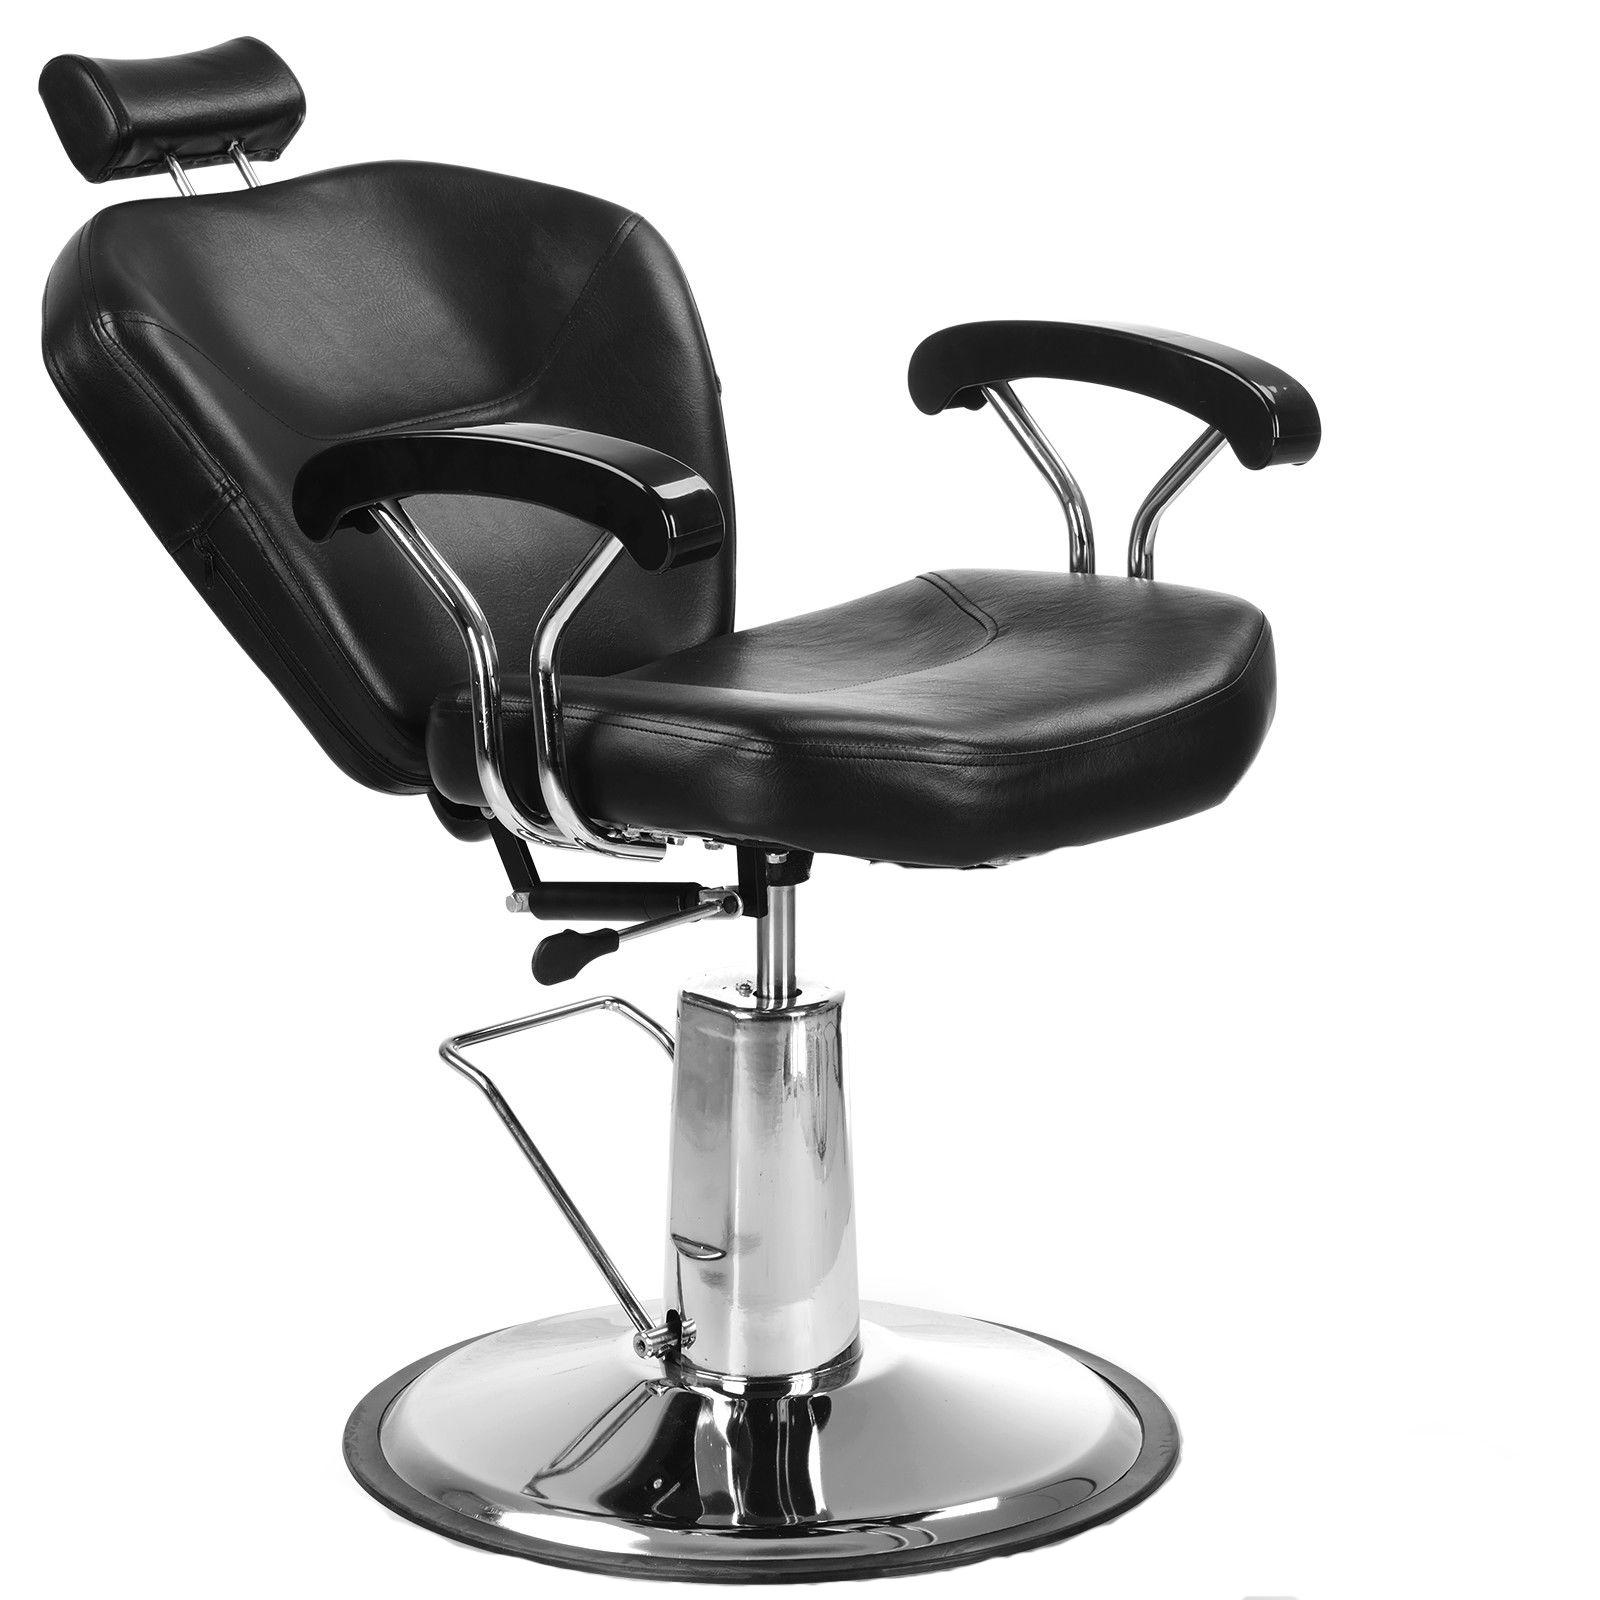 Fotel Fryzjerski Męski Barber Zagłówek Super Cena 7168398932